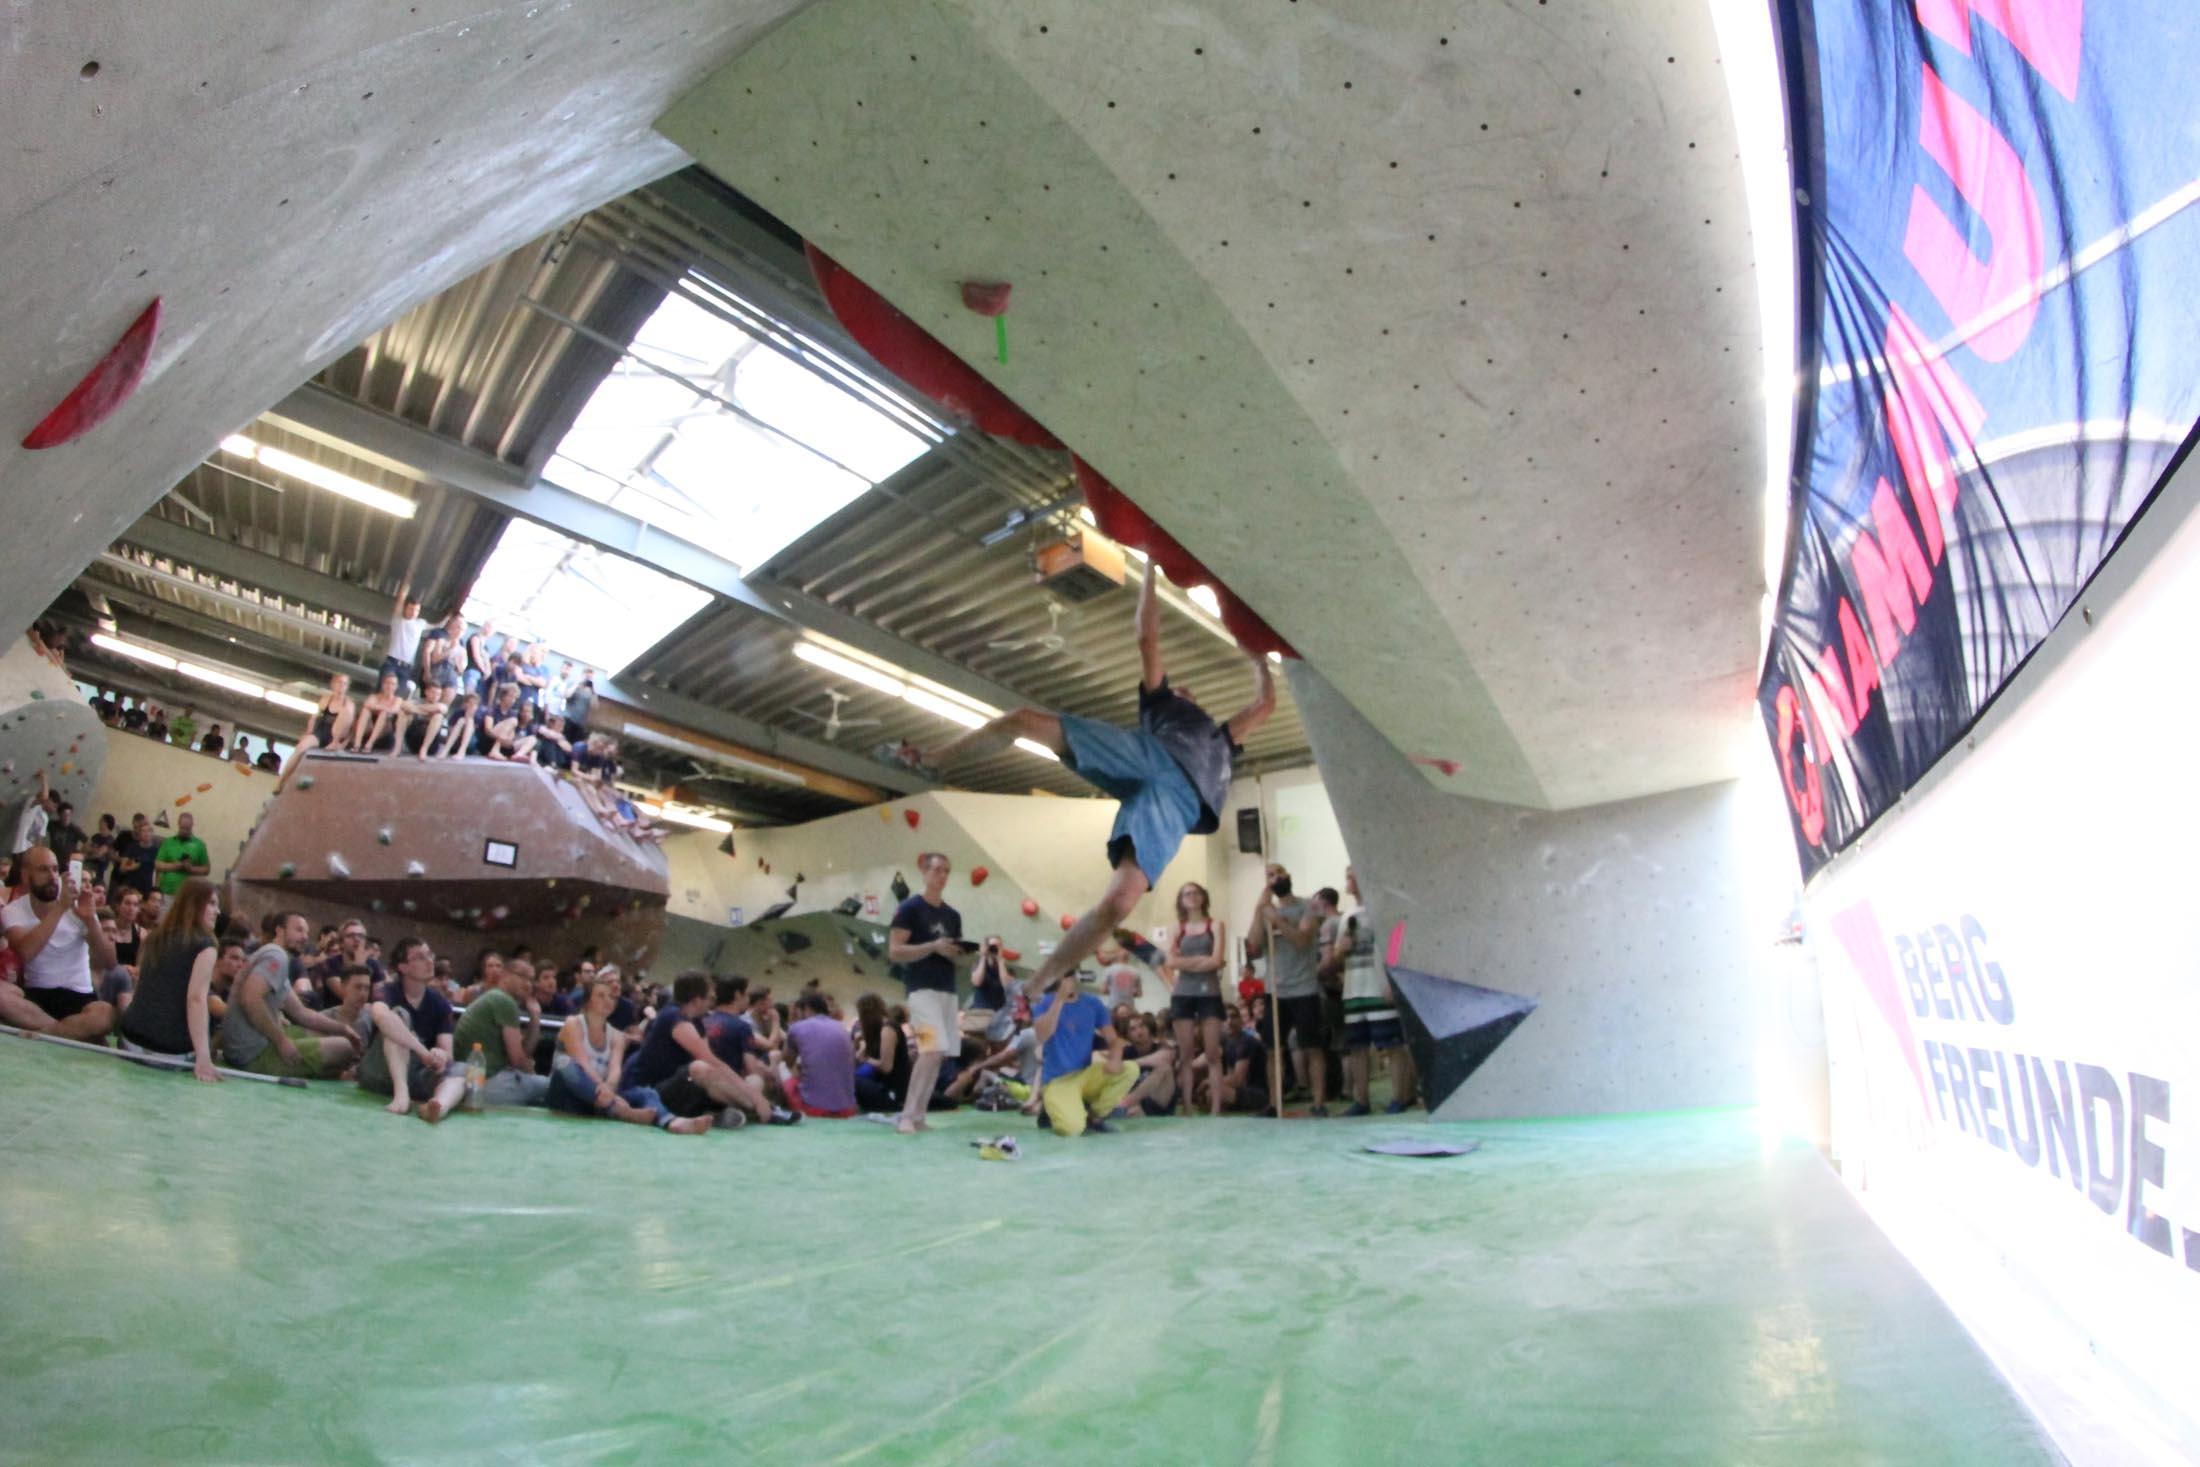 Finale, internationaler bouldercup Frankenjura 2016, BLOCKHELDEN Erlangen, Mammut, Bergfreunde.de, Boulderwettkampf07092016612